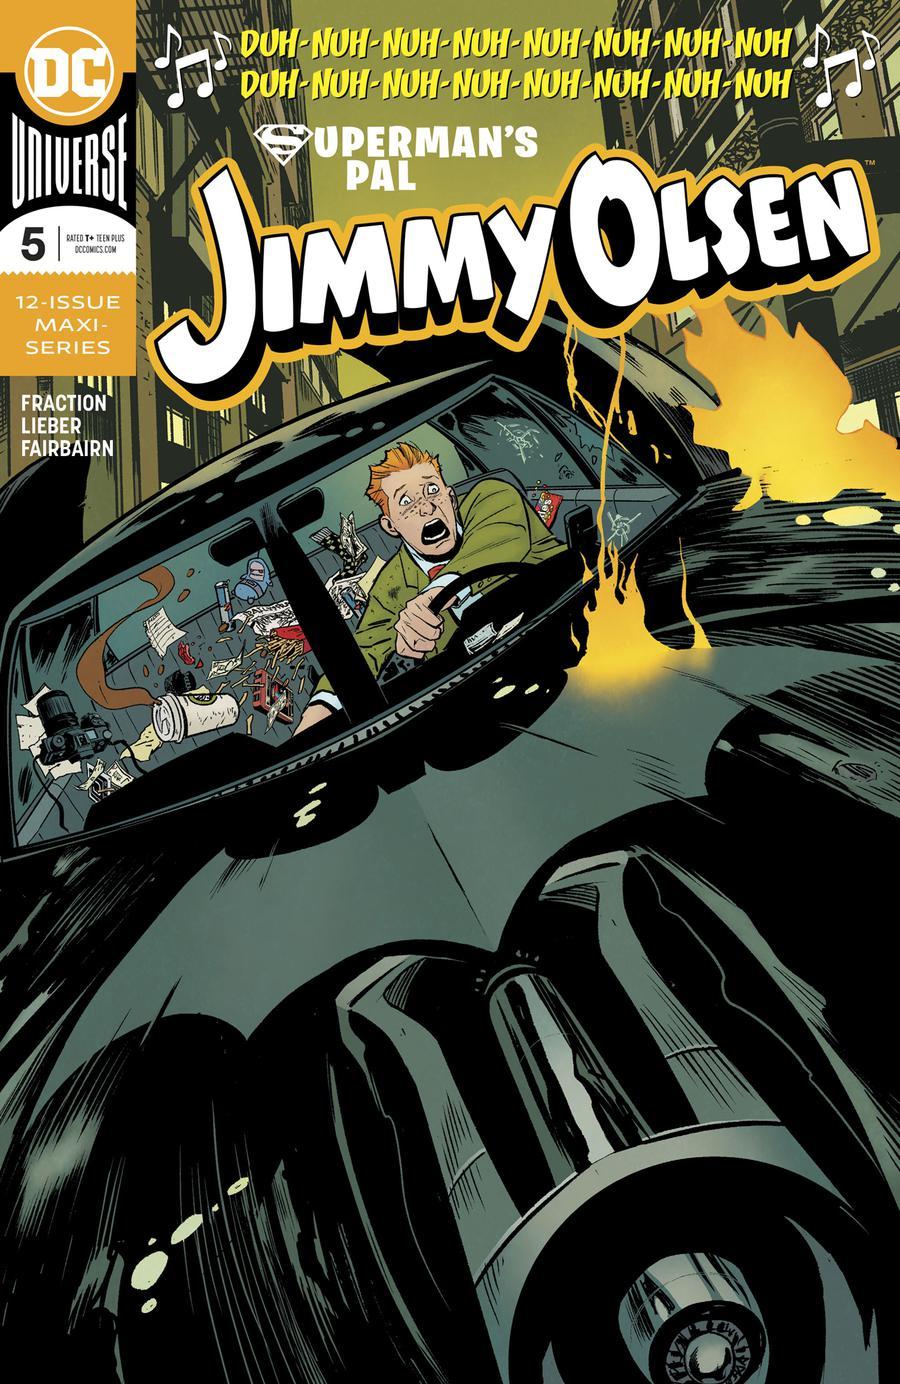 Supermans Pal Jimmy Olsen Vol 2 #5 Cover A Regular Steve Lieber Cover